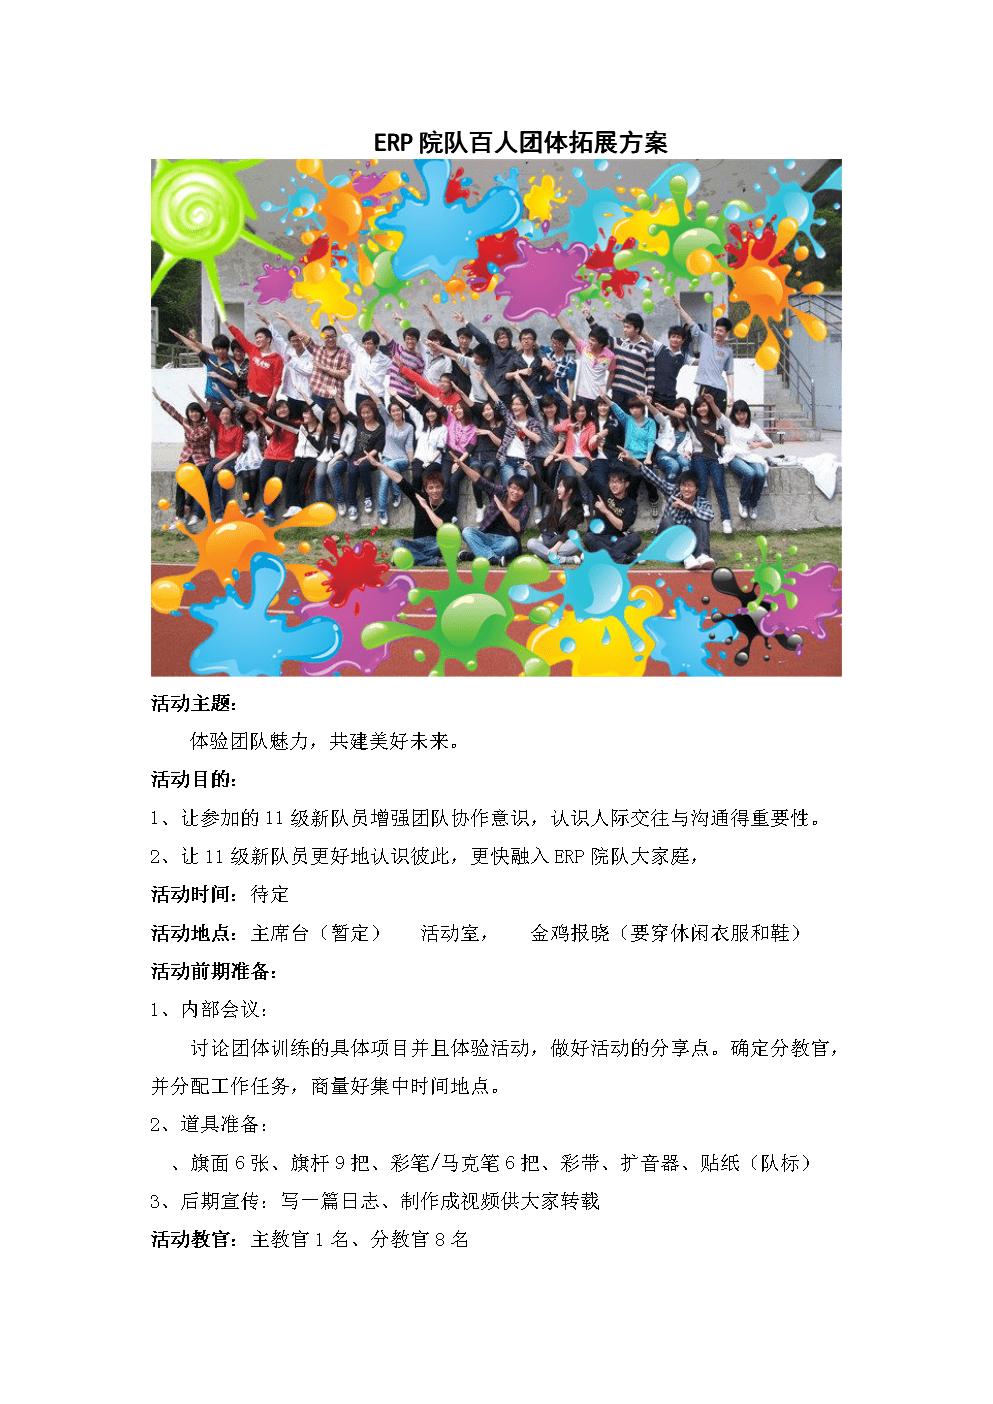 ERP百人团队拓展实施方案.doc